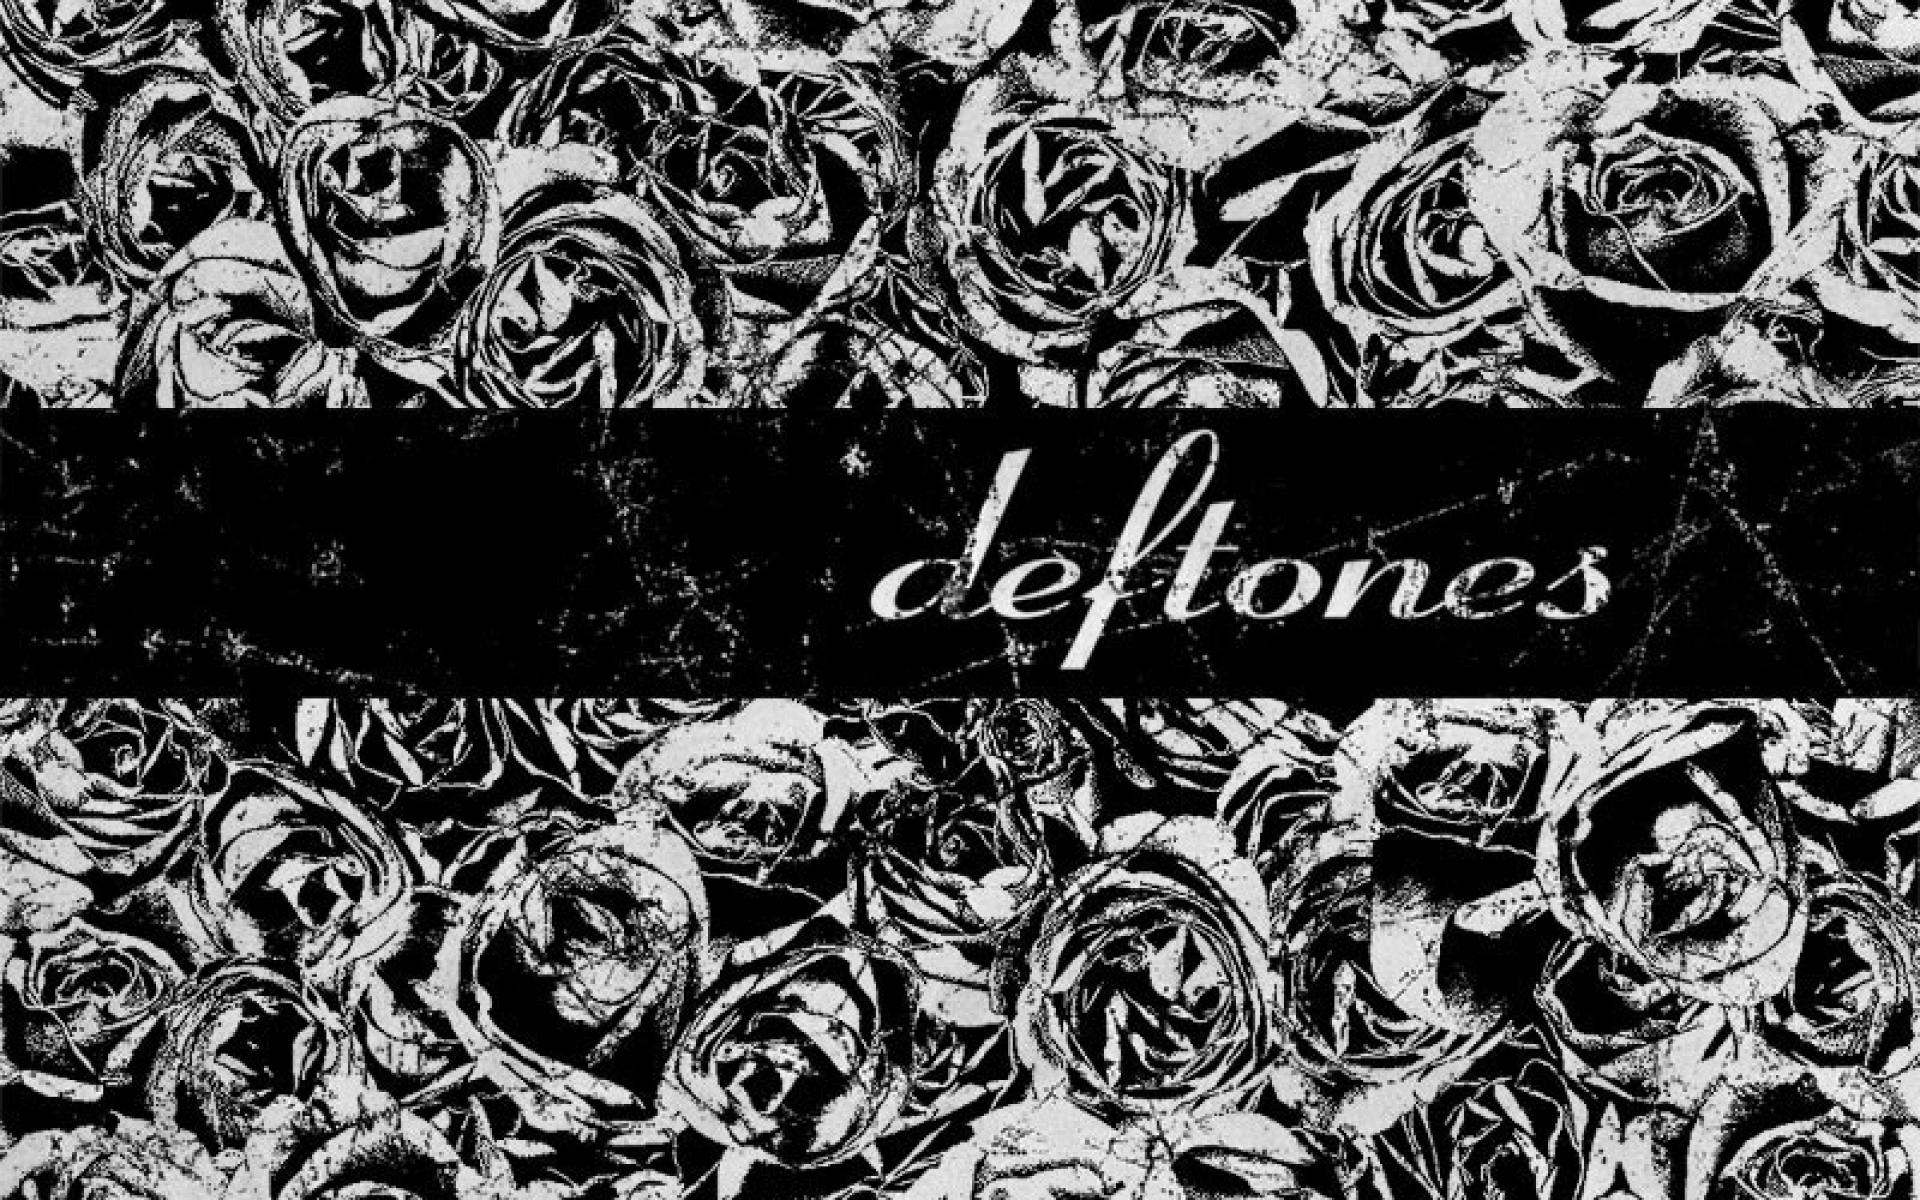 Grunge deftones grayscale roses wallpaper 40524 1920x1200